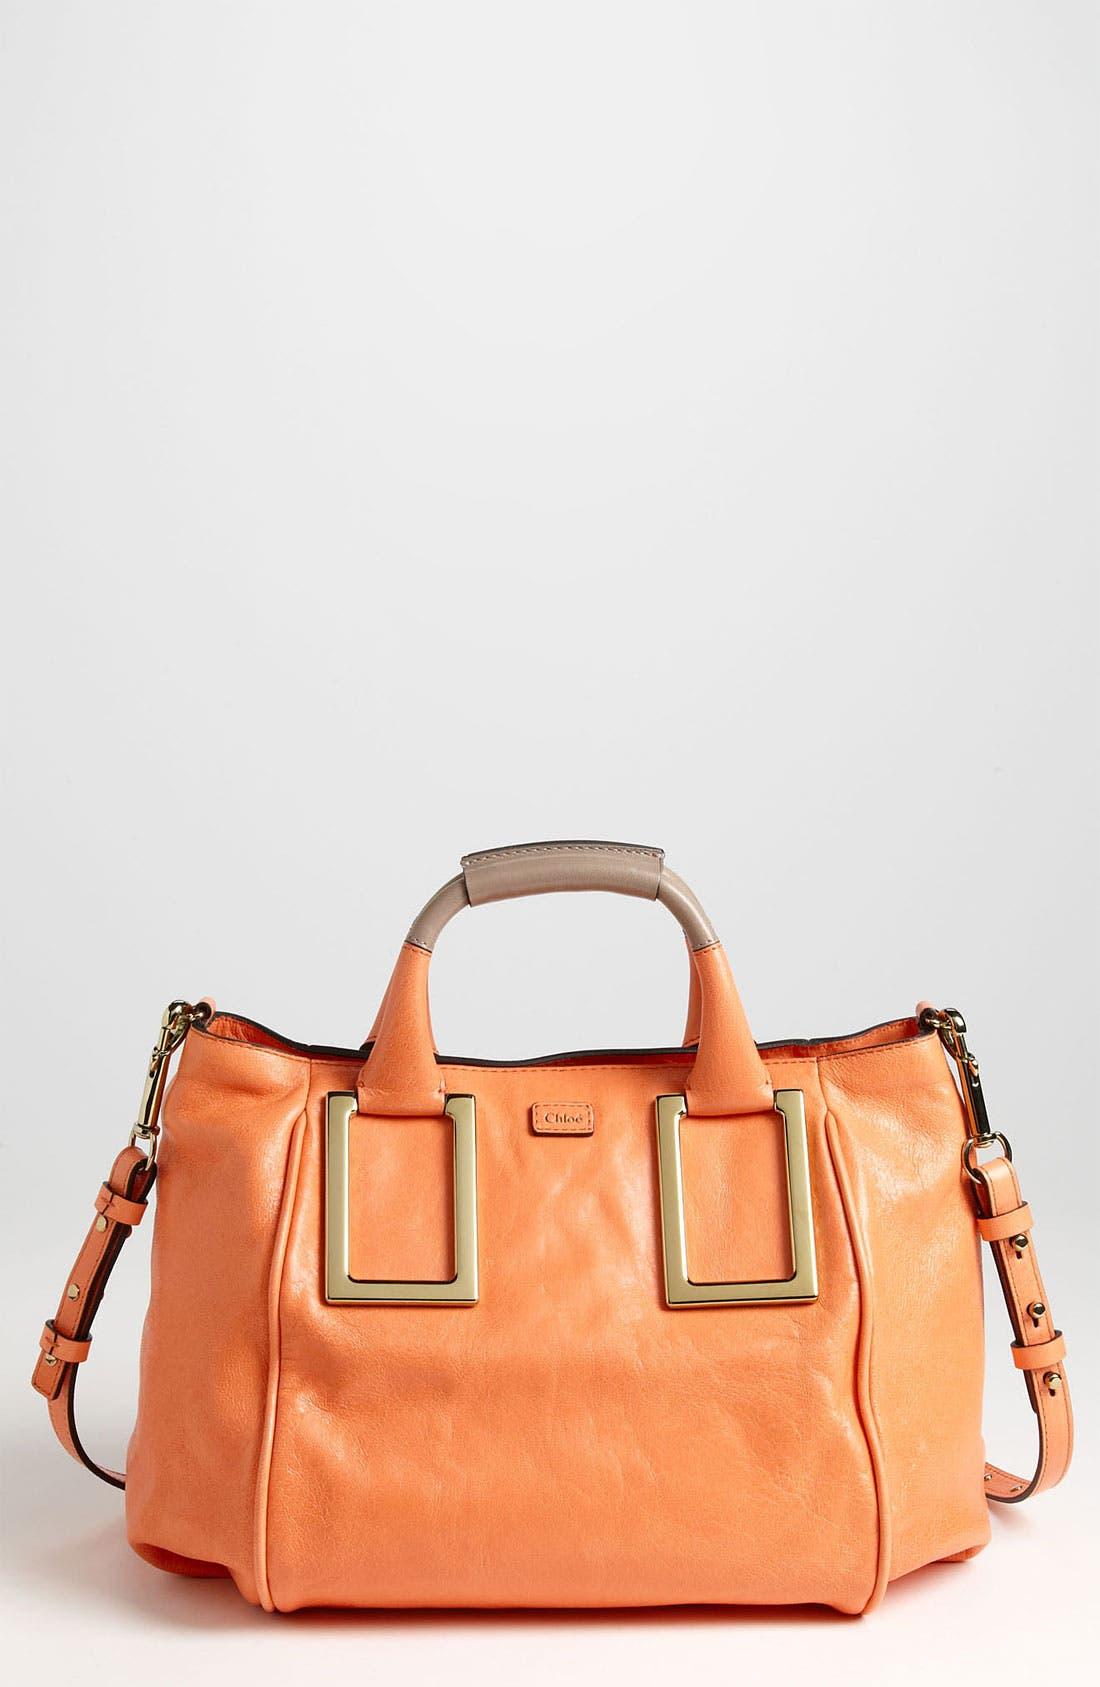 Main Image - Chloé 'Ethel - Medium' Leather Satchel